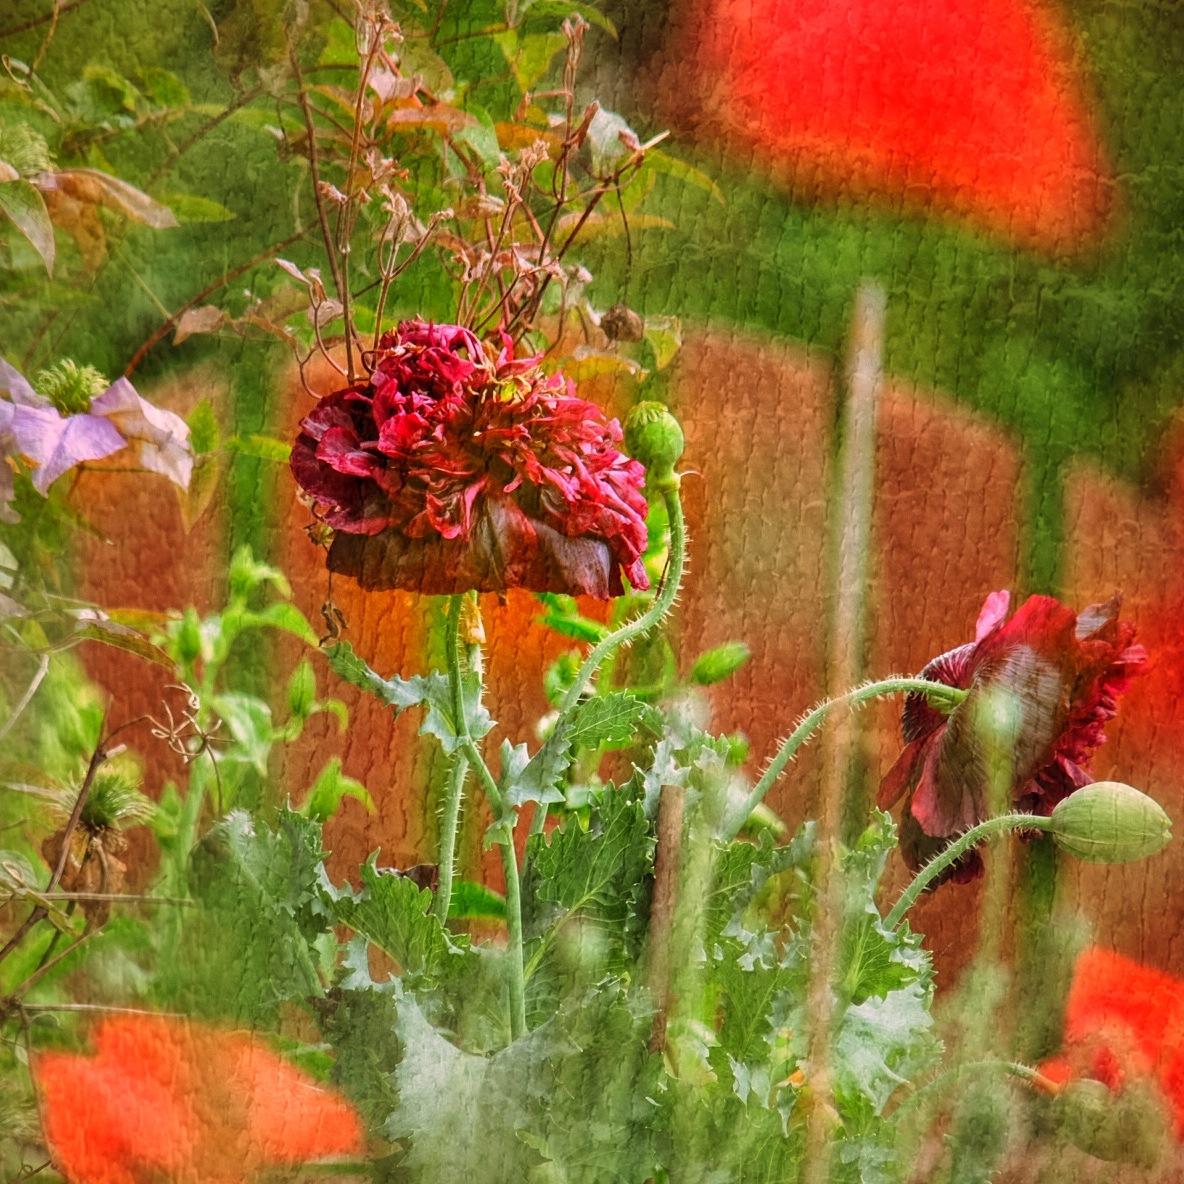 Image Flowers...i090601 by Michael jjg